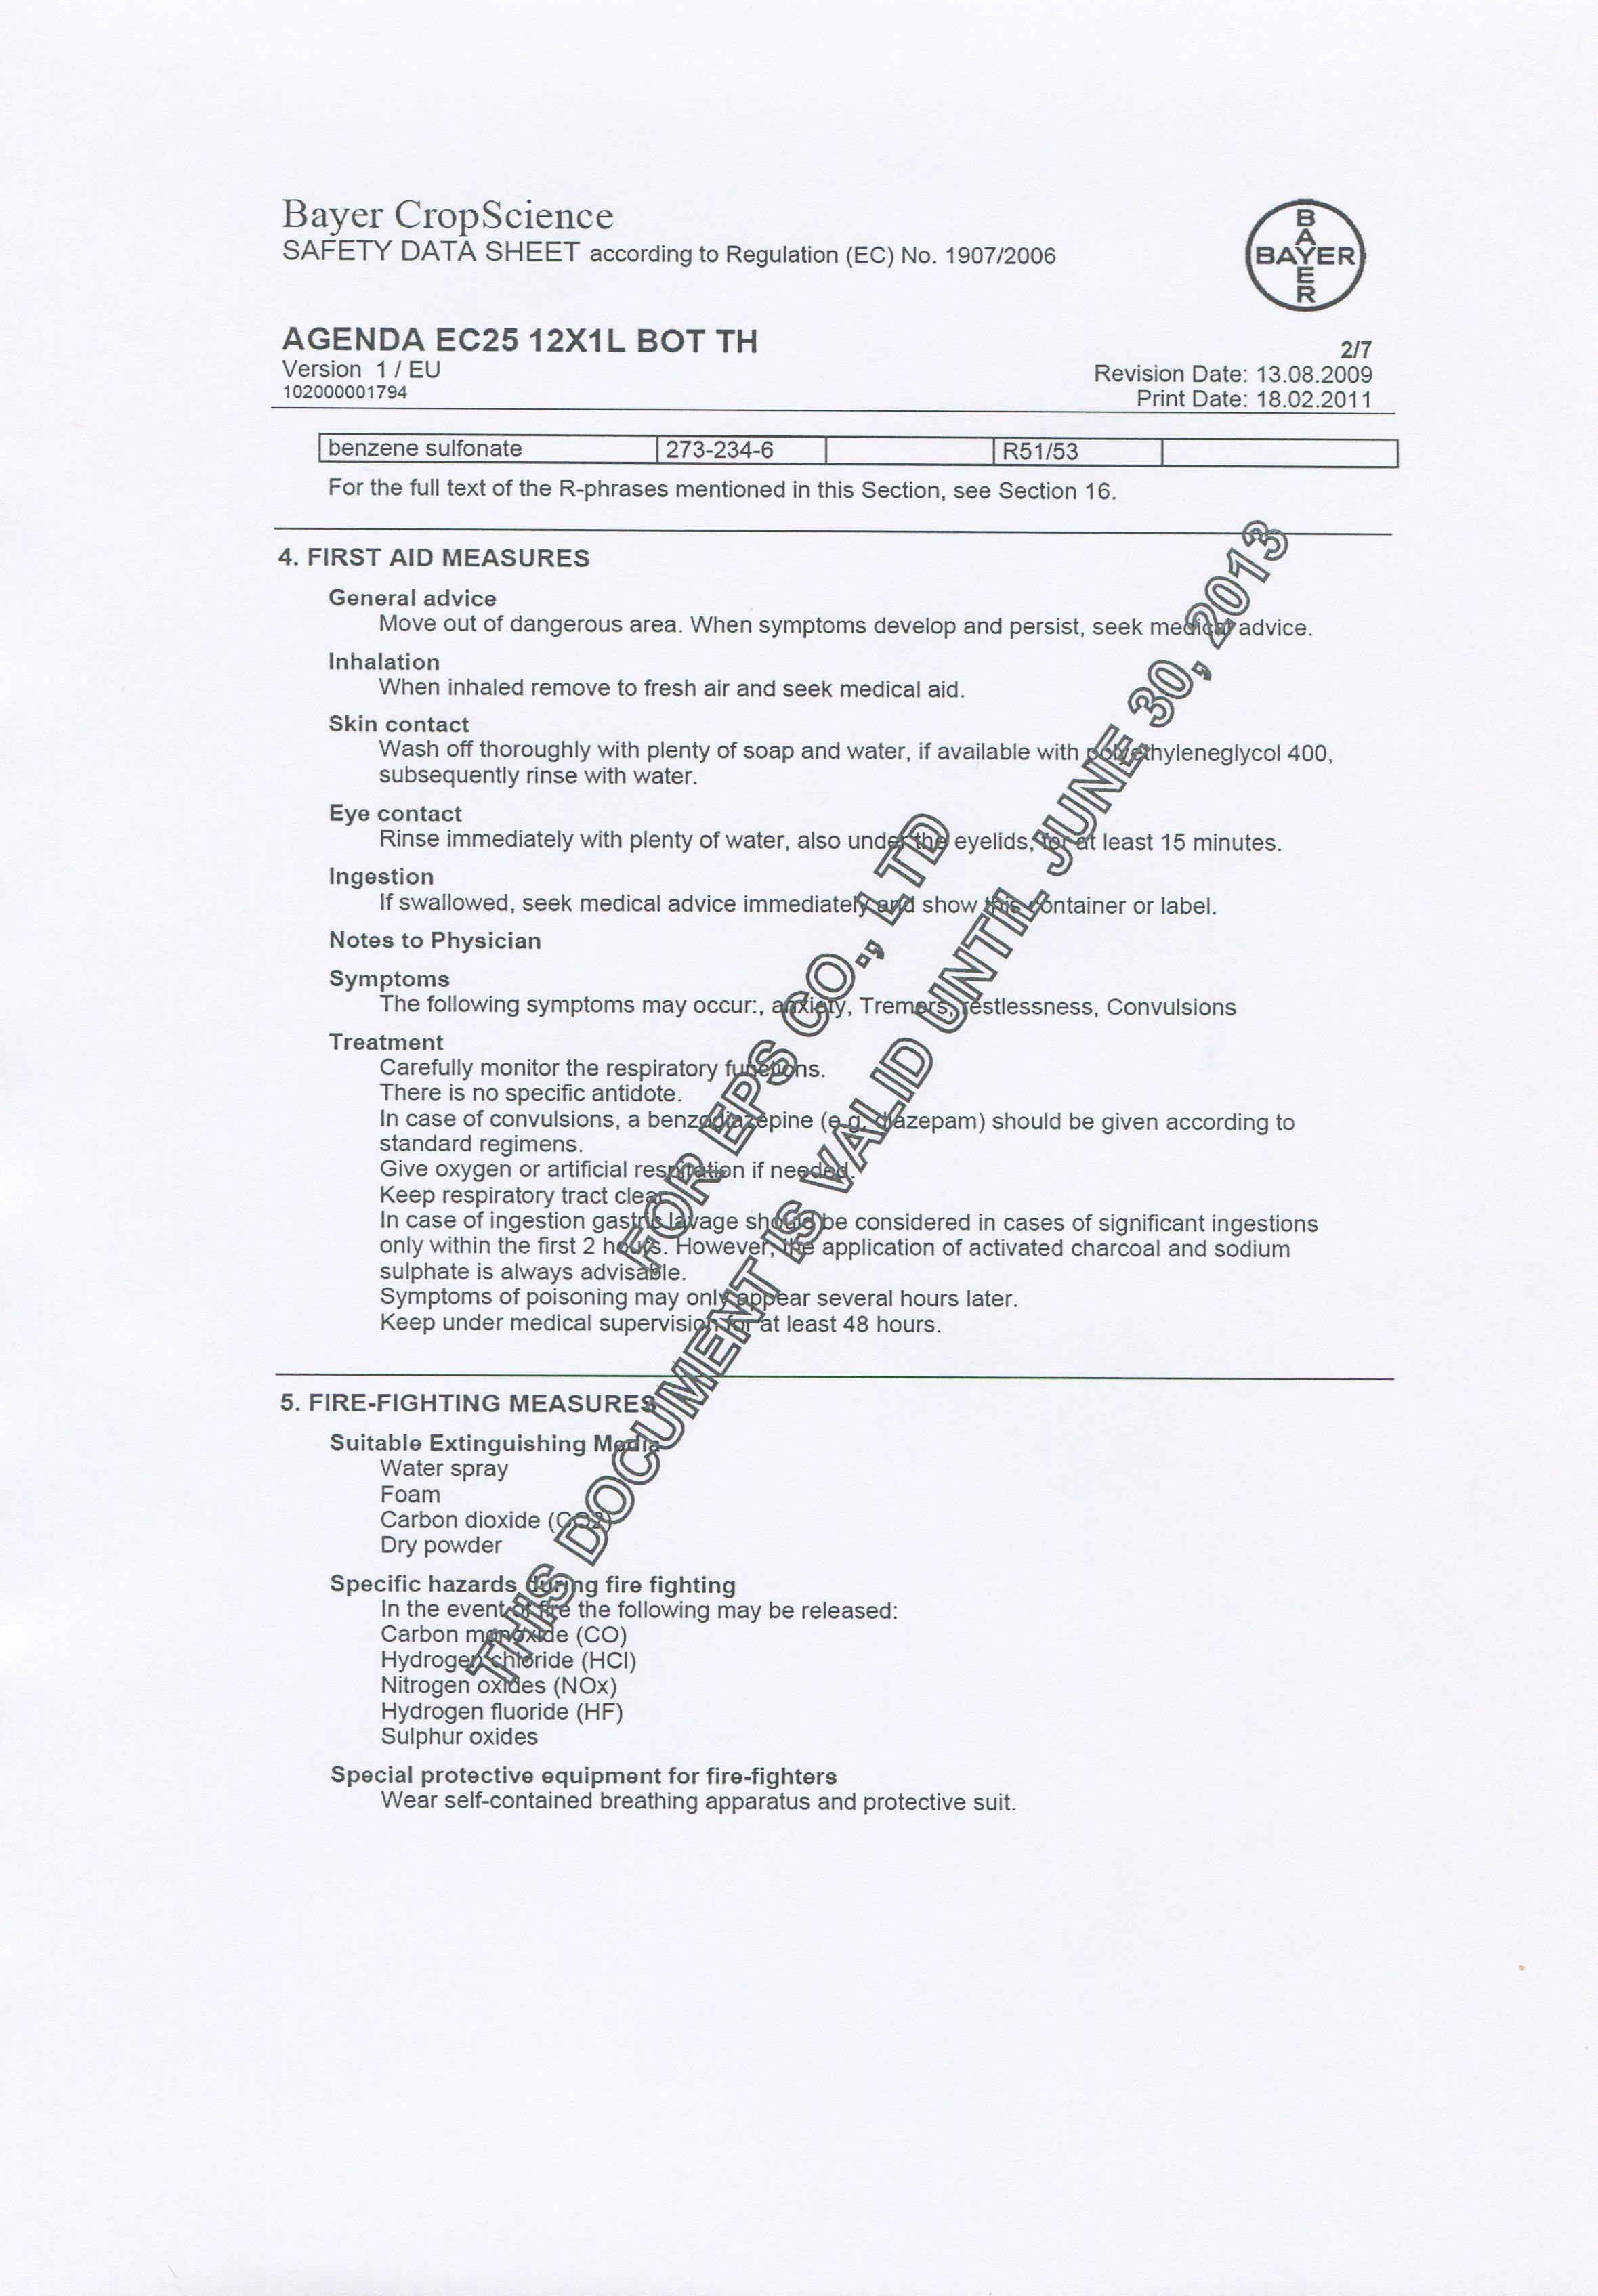 Agenda EC25- MSDS